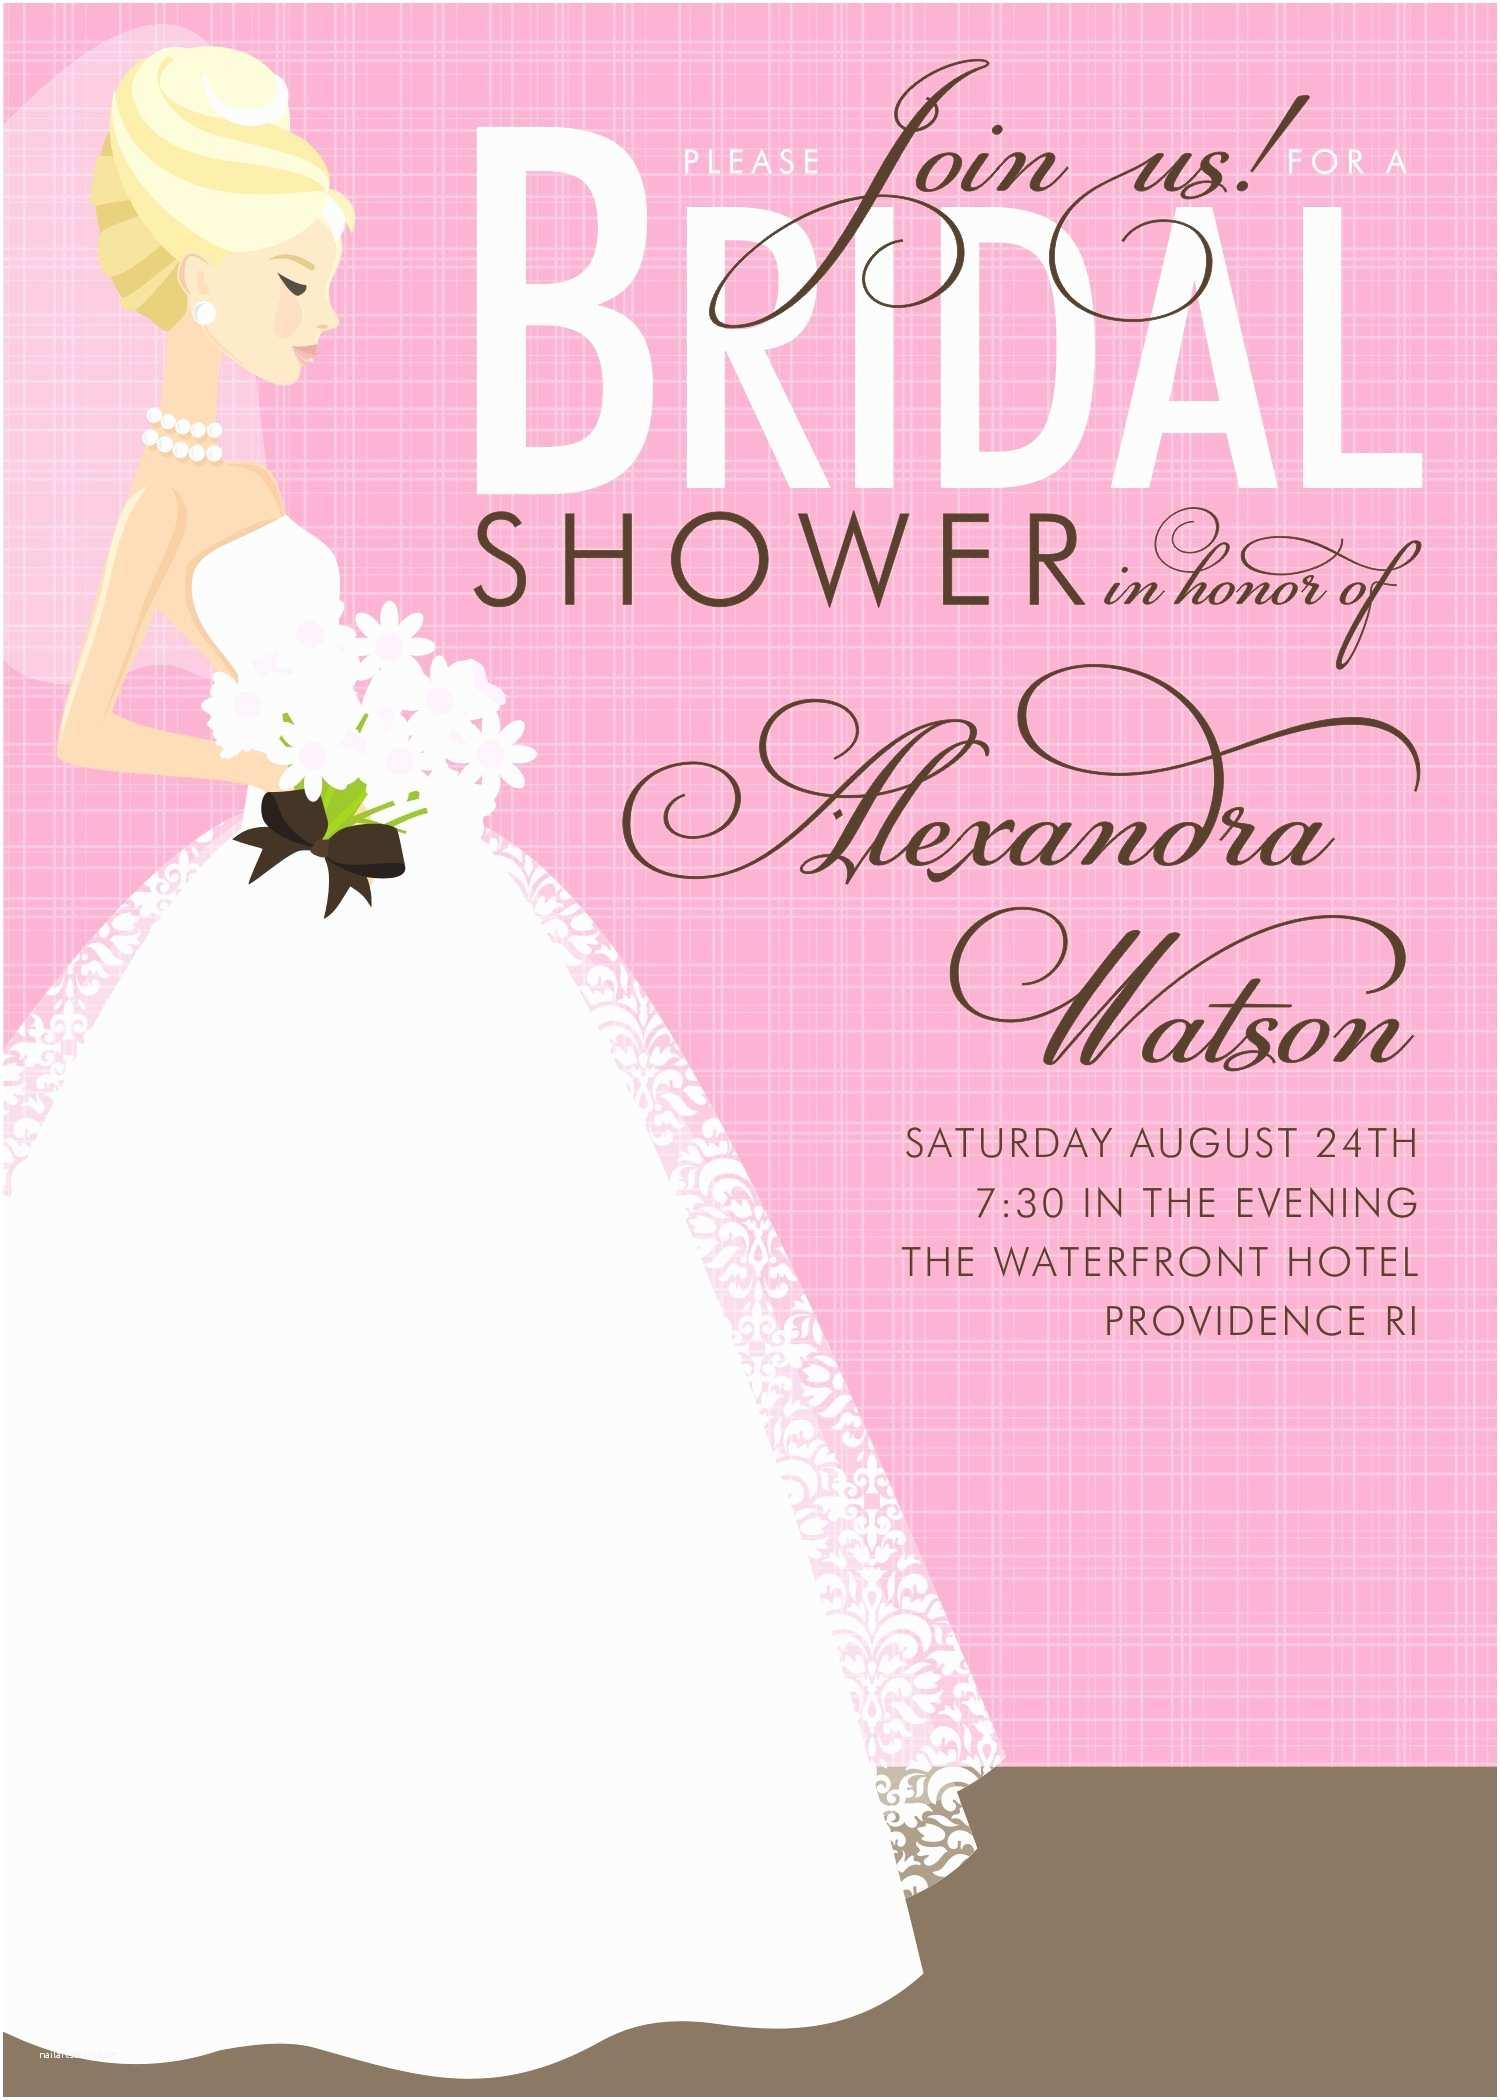 Wedding Divas Bridal Shower Invitations Paper Divas Bridal Shower Invitations Gallery Baby